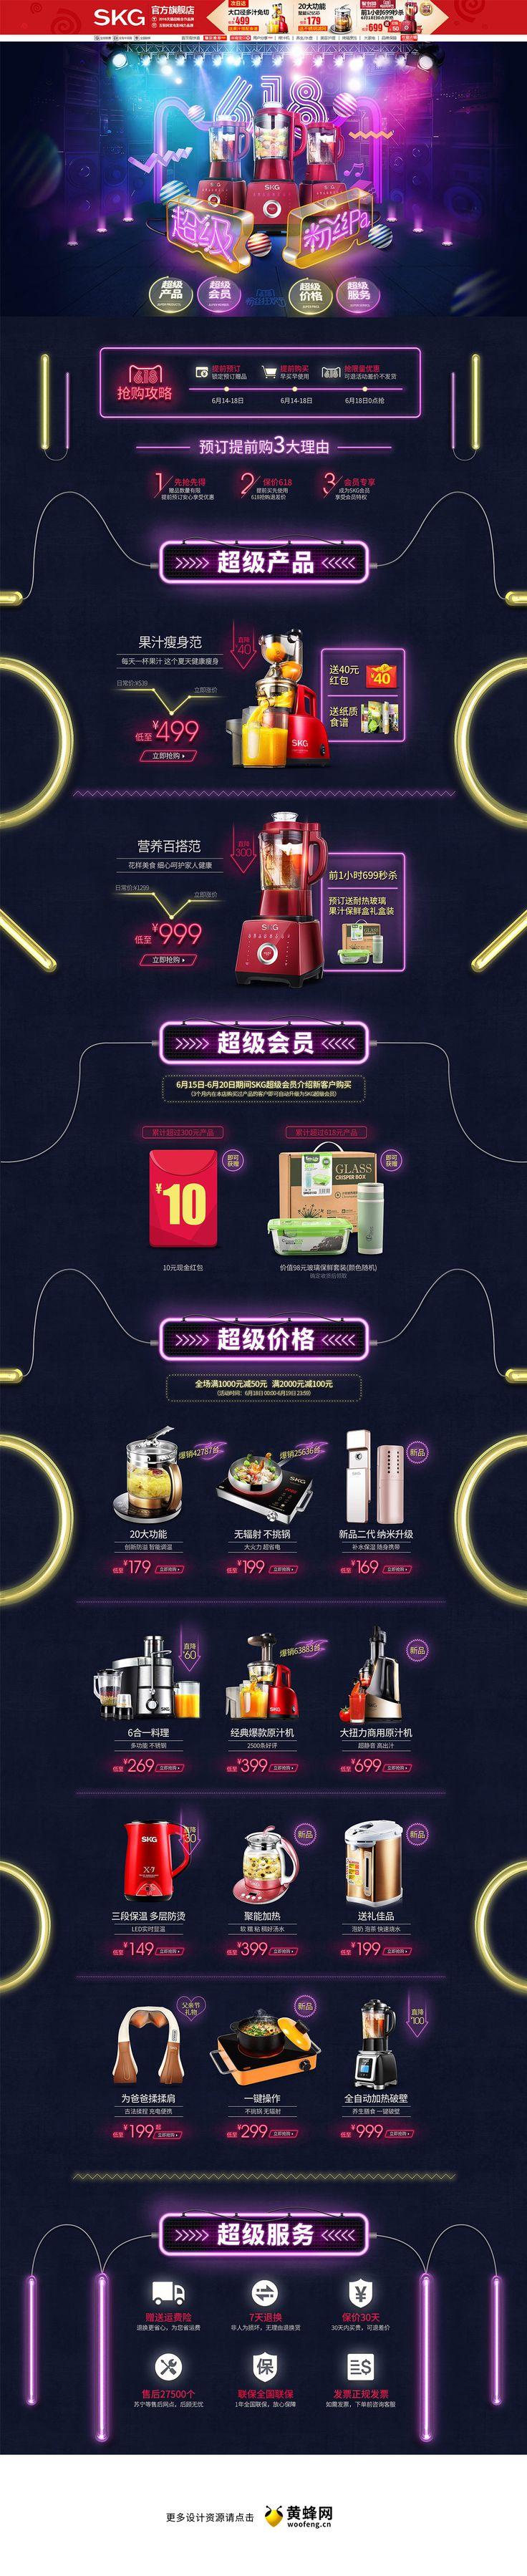 skg家用电器618天猫粉丝节年中大促天猫店铺首页设计